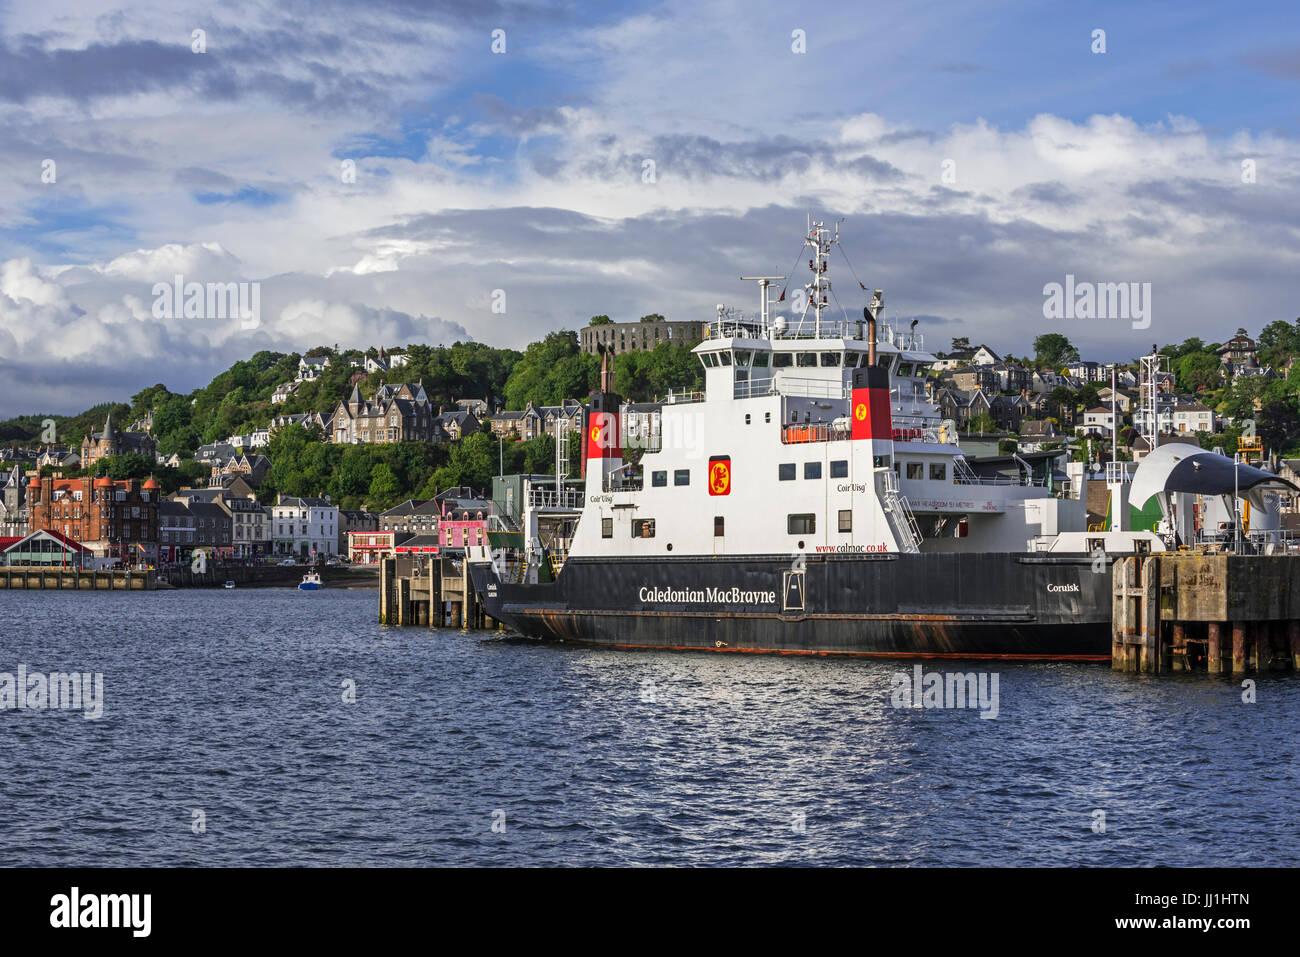 MV Coruisk ferry boat from Caledonian MacBrayne docked in the Oban port, Argyll and Bute, Scotland, UK Stock Photo